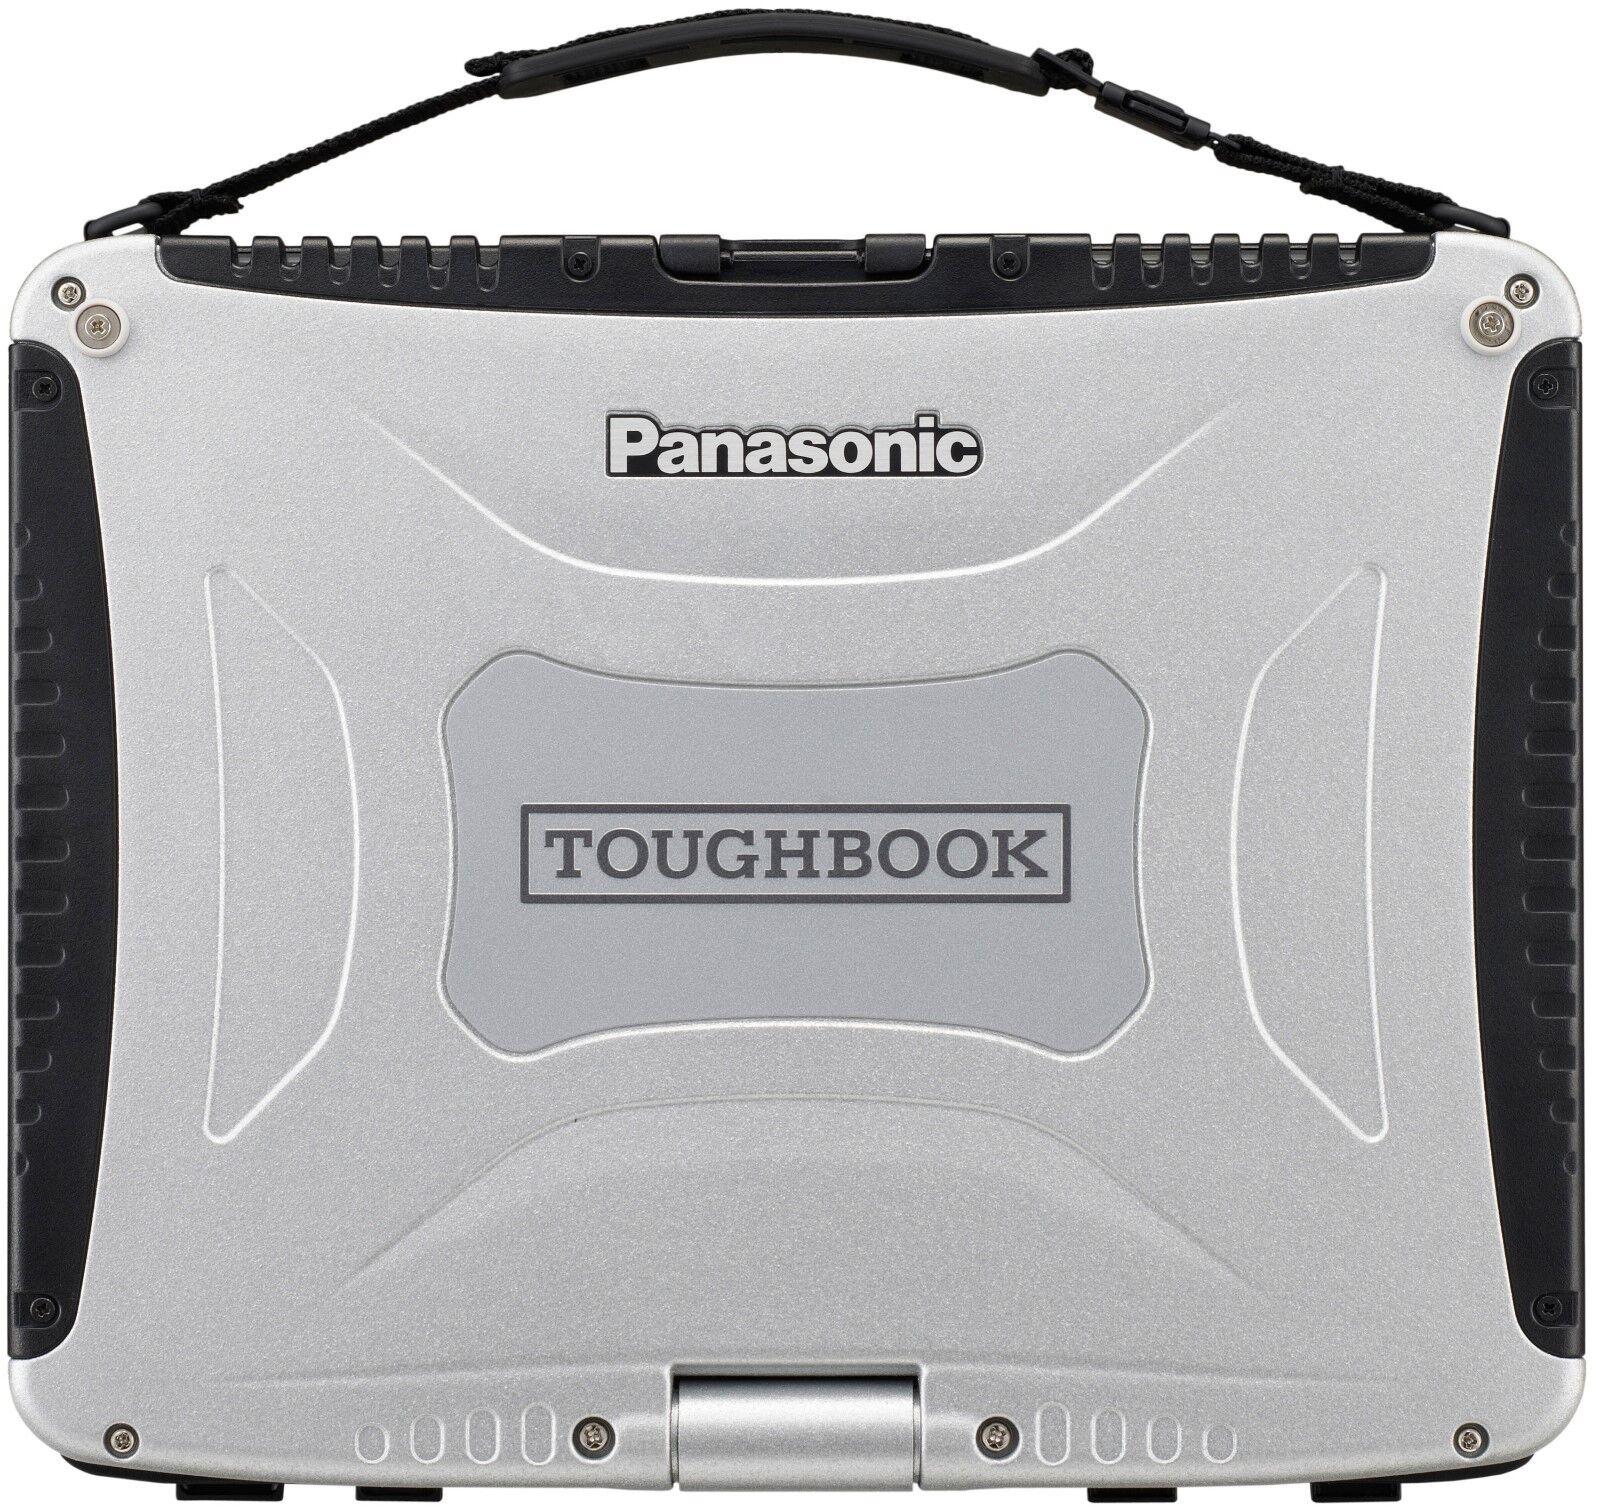 Toughbook CF-19 MK6, i5-3320M/2.6GHz/8GB/1TB/Dual-Touch/GPS/GOBI2000/WIN7 64BIT